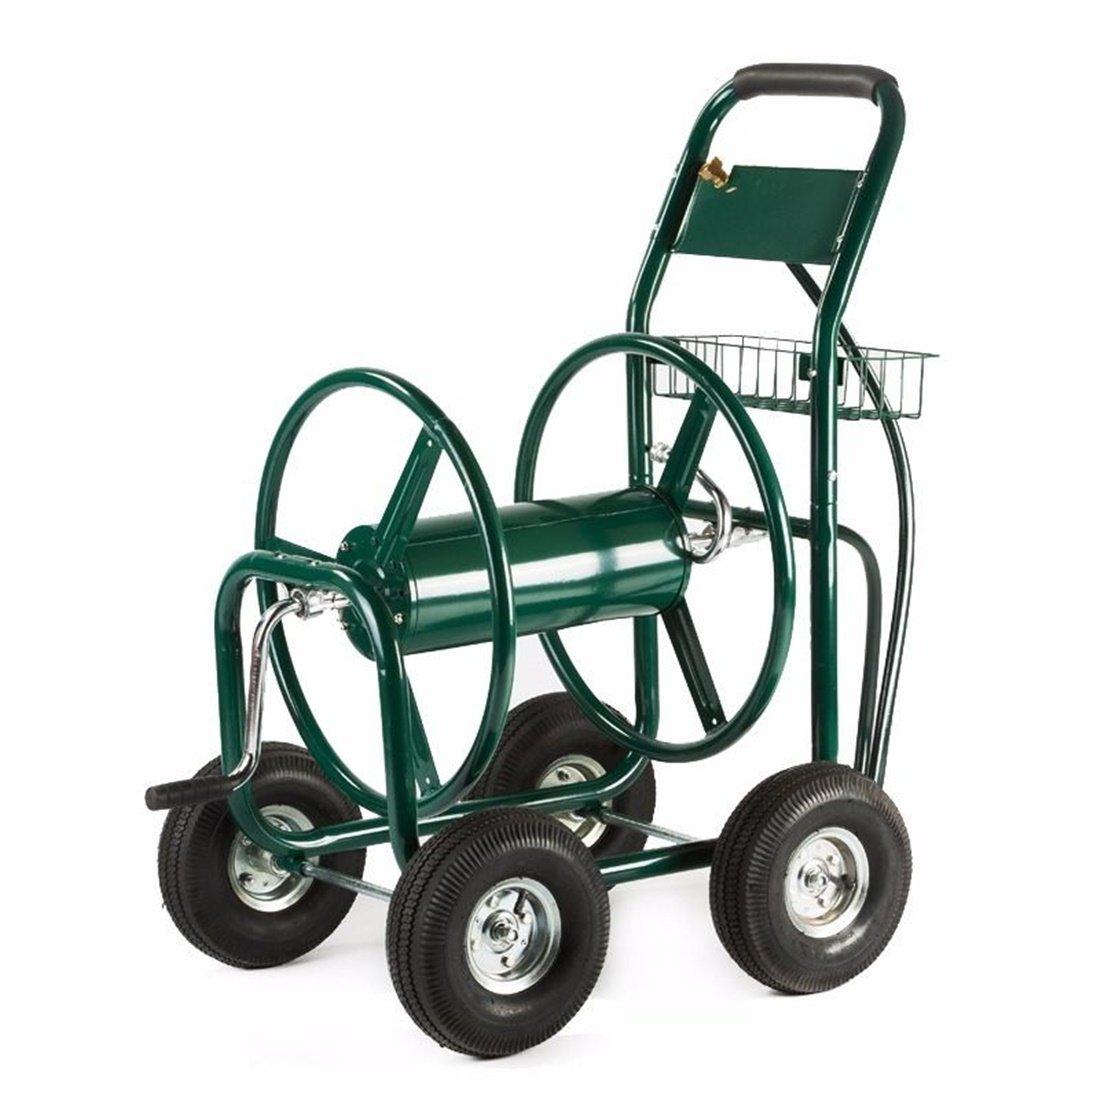 WShop 300 FT Garden Water Hose Reel Cart Outdoor Heavy Duty Yard Water Planting New